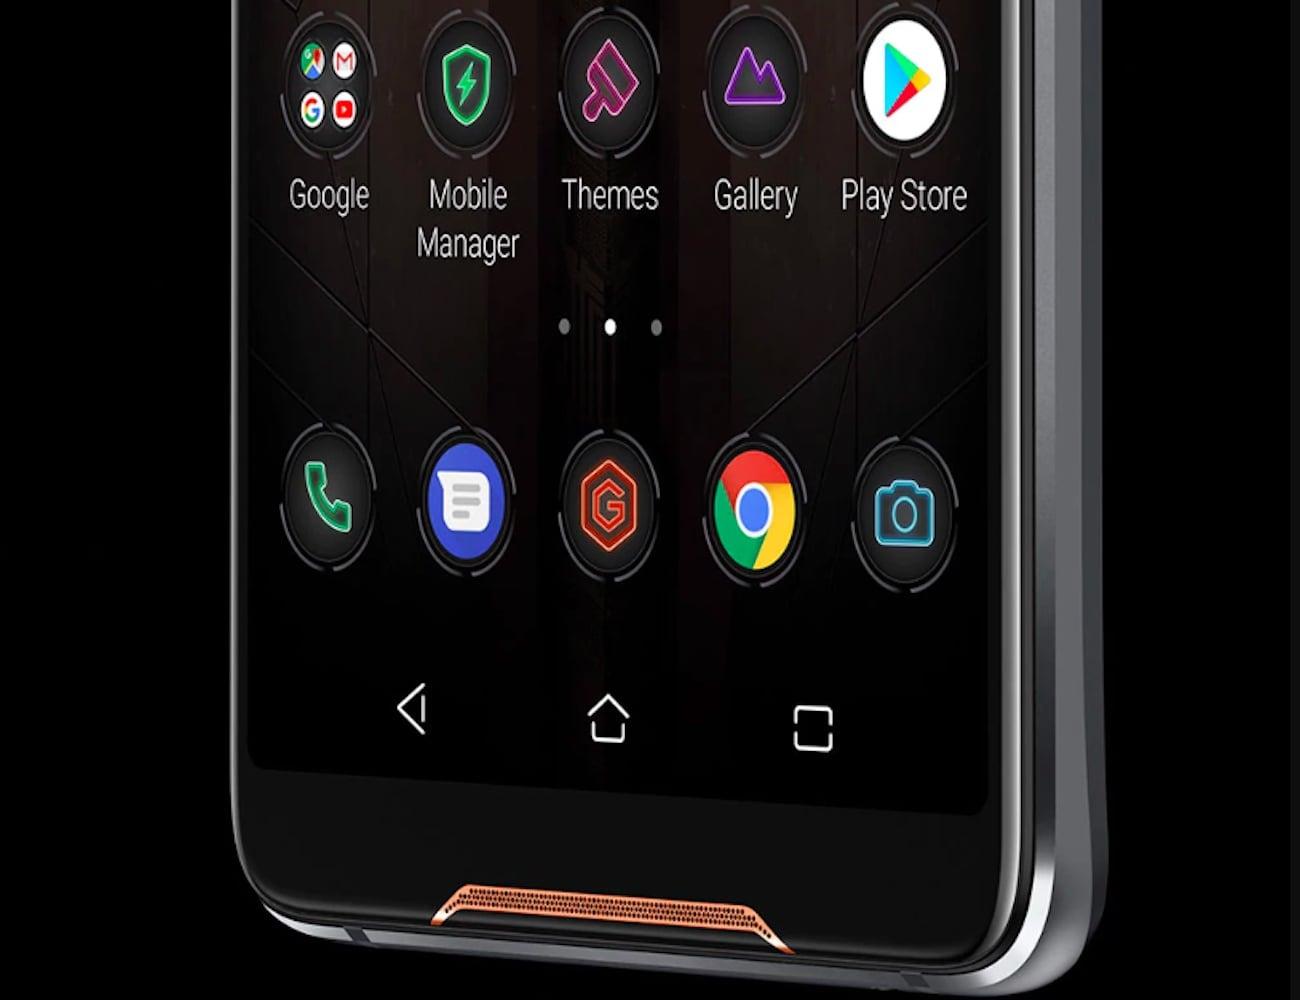 Asus ROG Android Gaming Phone